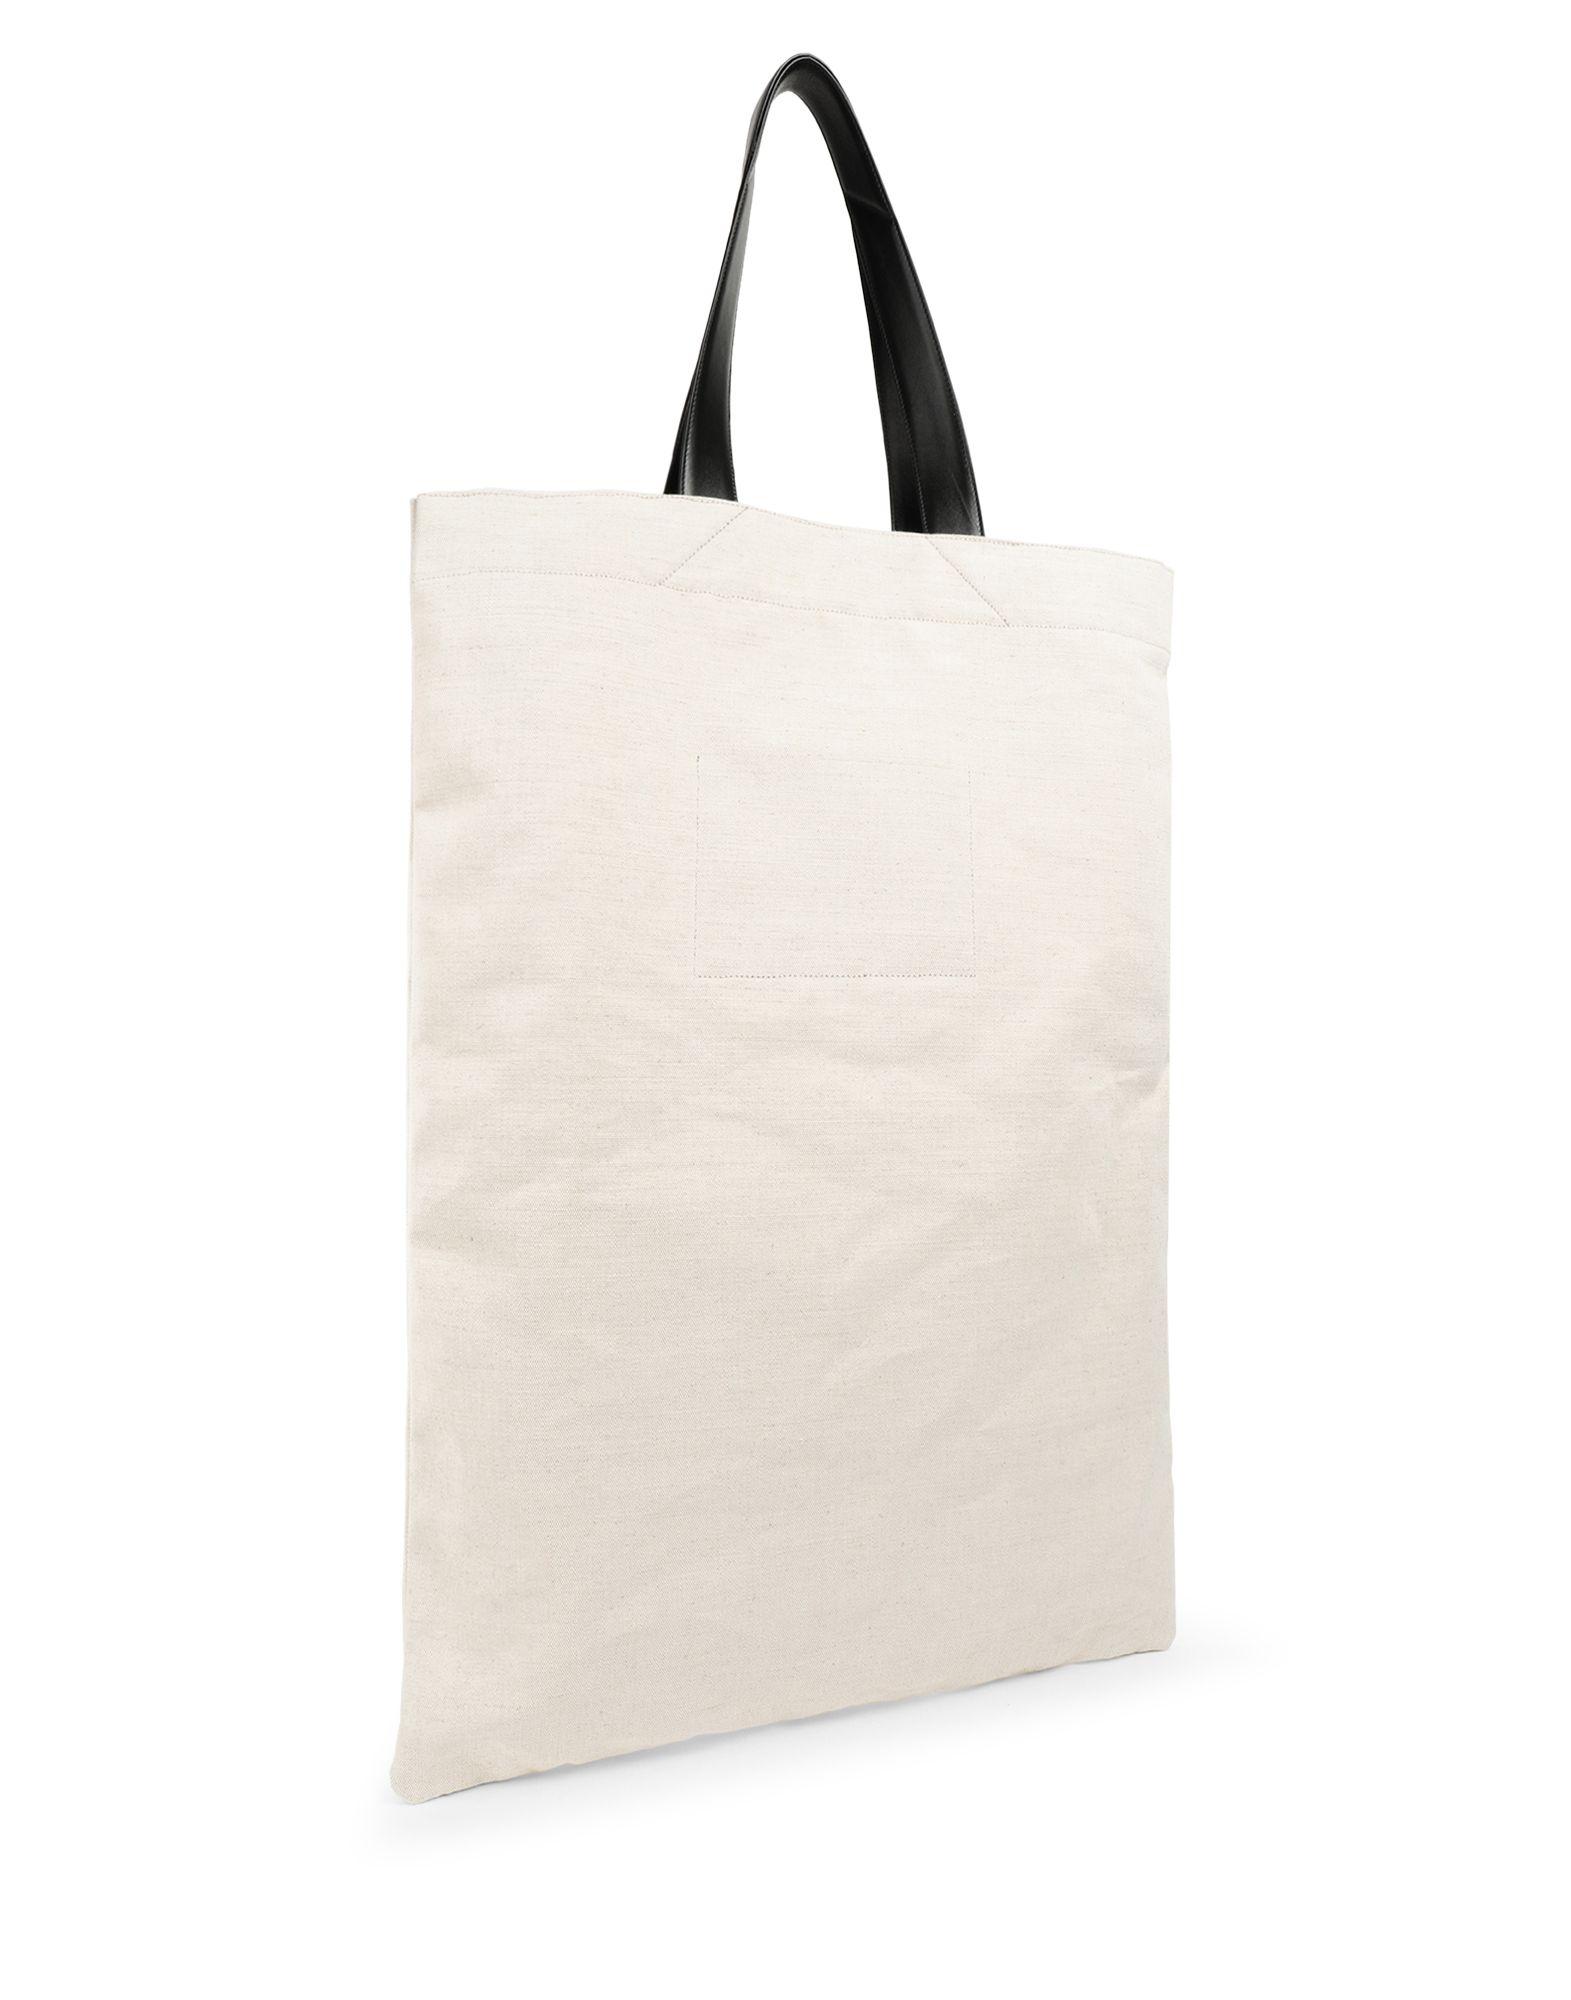 Shopper - JIL SANDER Online Store